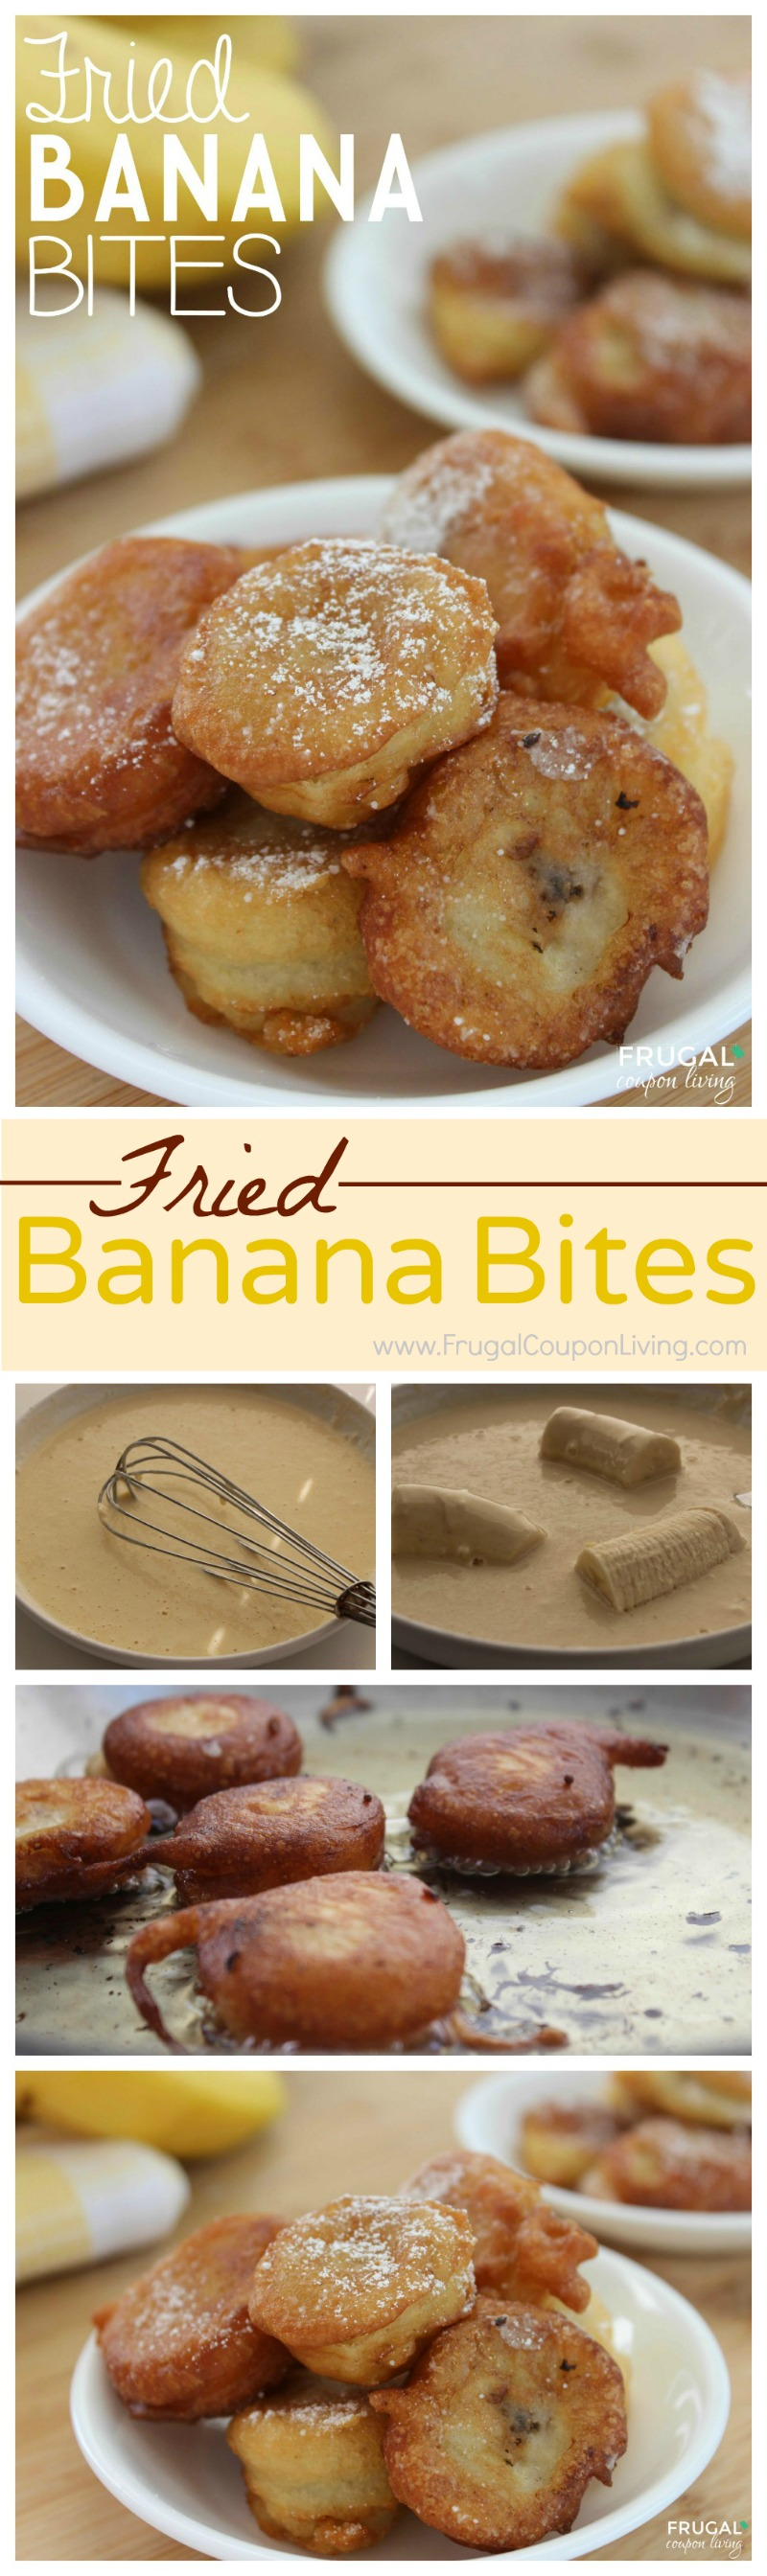 fried-banana-bites-Collage-frugal-coupon-living